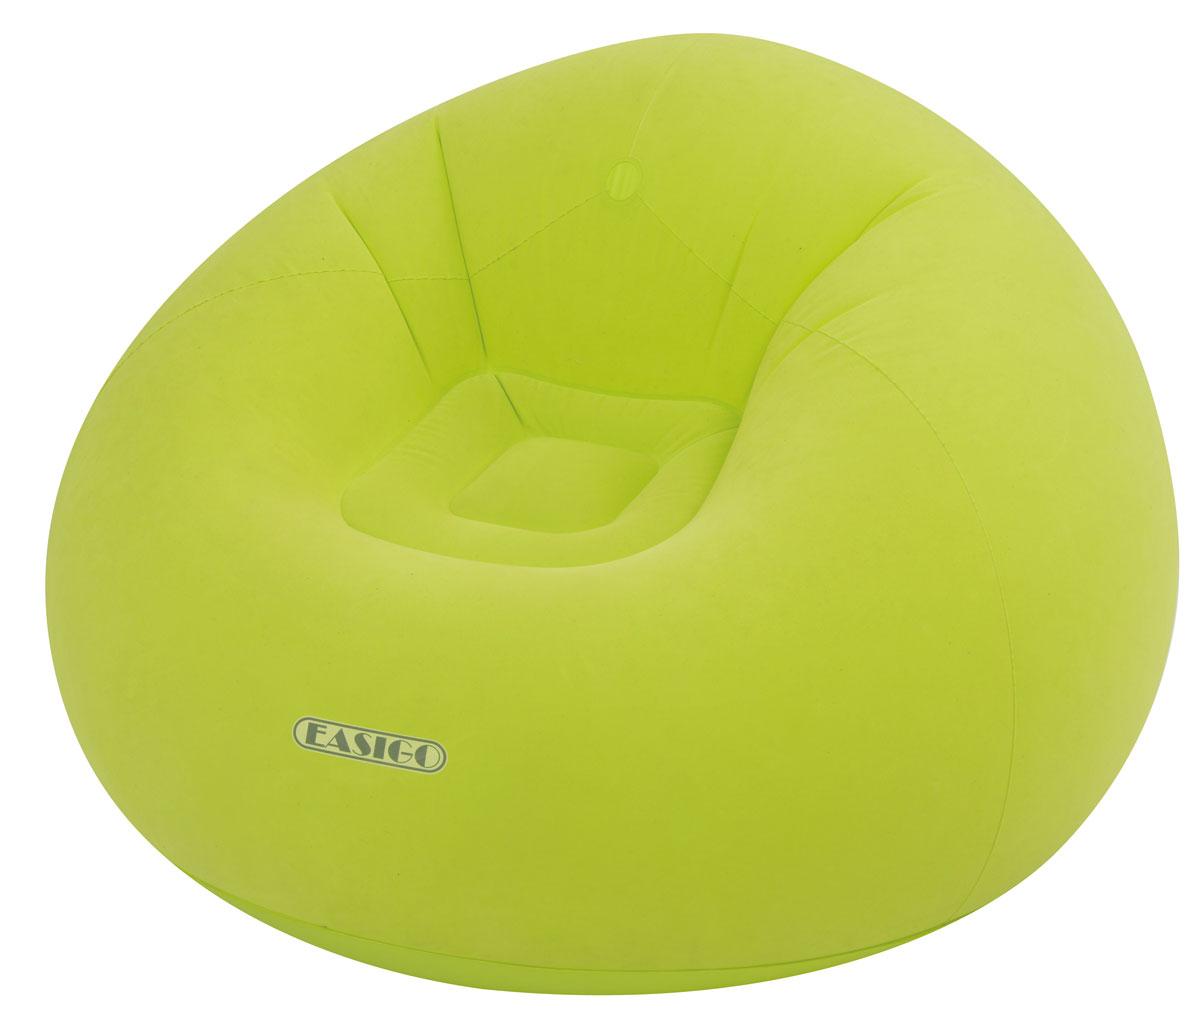 Кресло надувное Relax Easigo, цвет: салатовый, 105 х 105 х 65 см ceramic super oil stone metal holder tool 3mm round silver tone